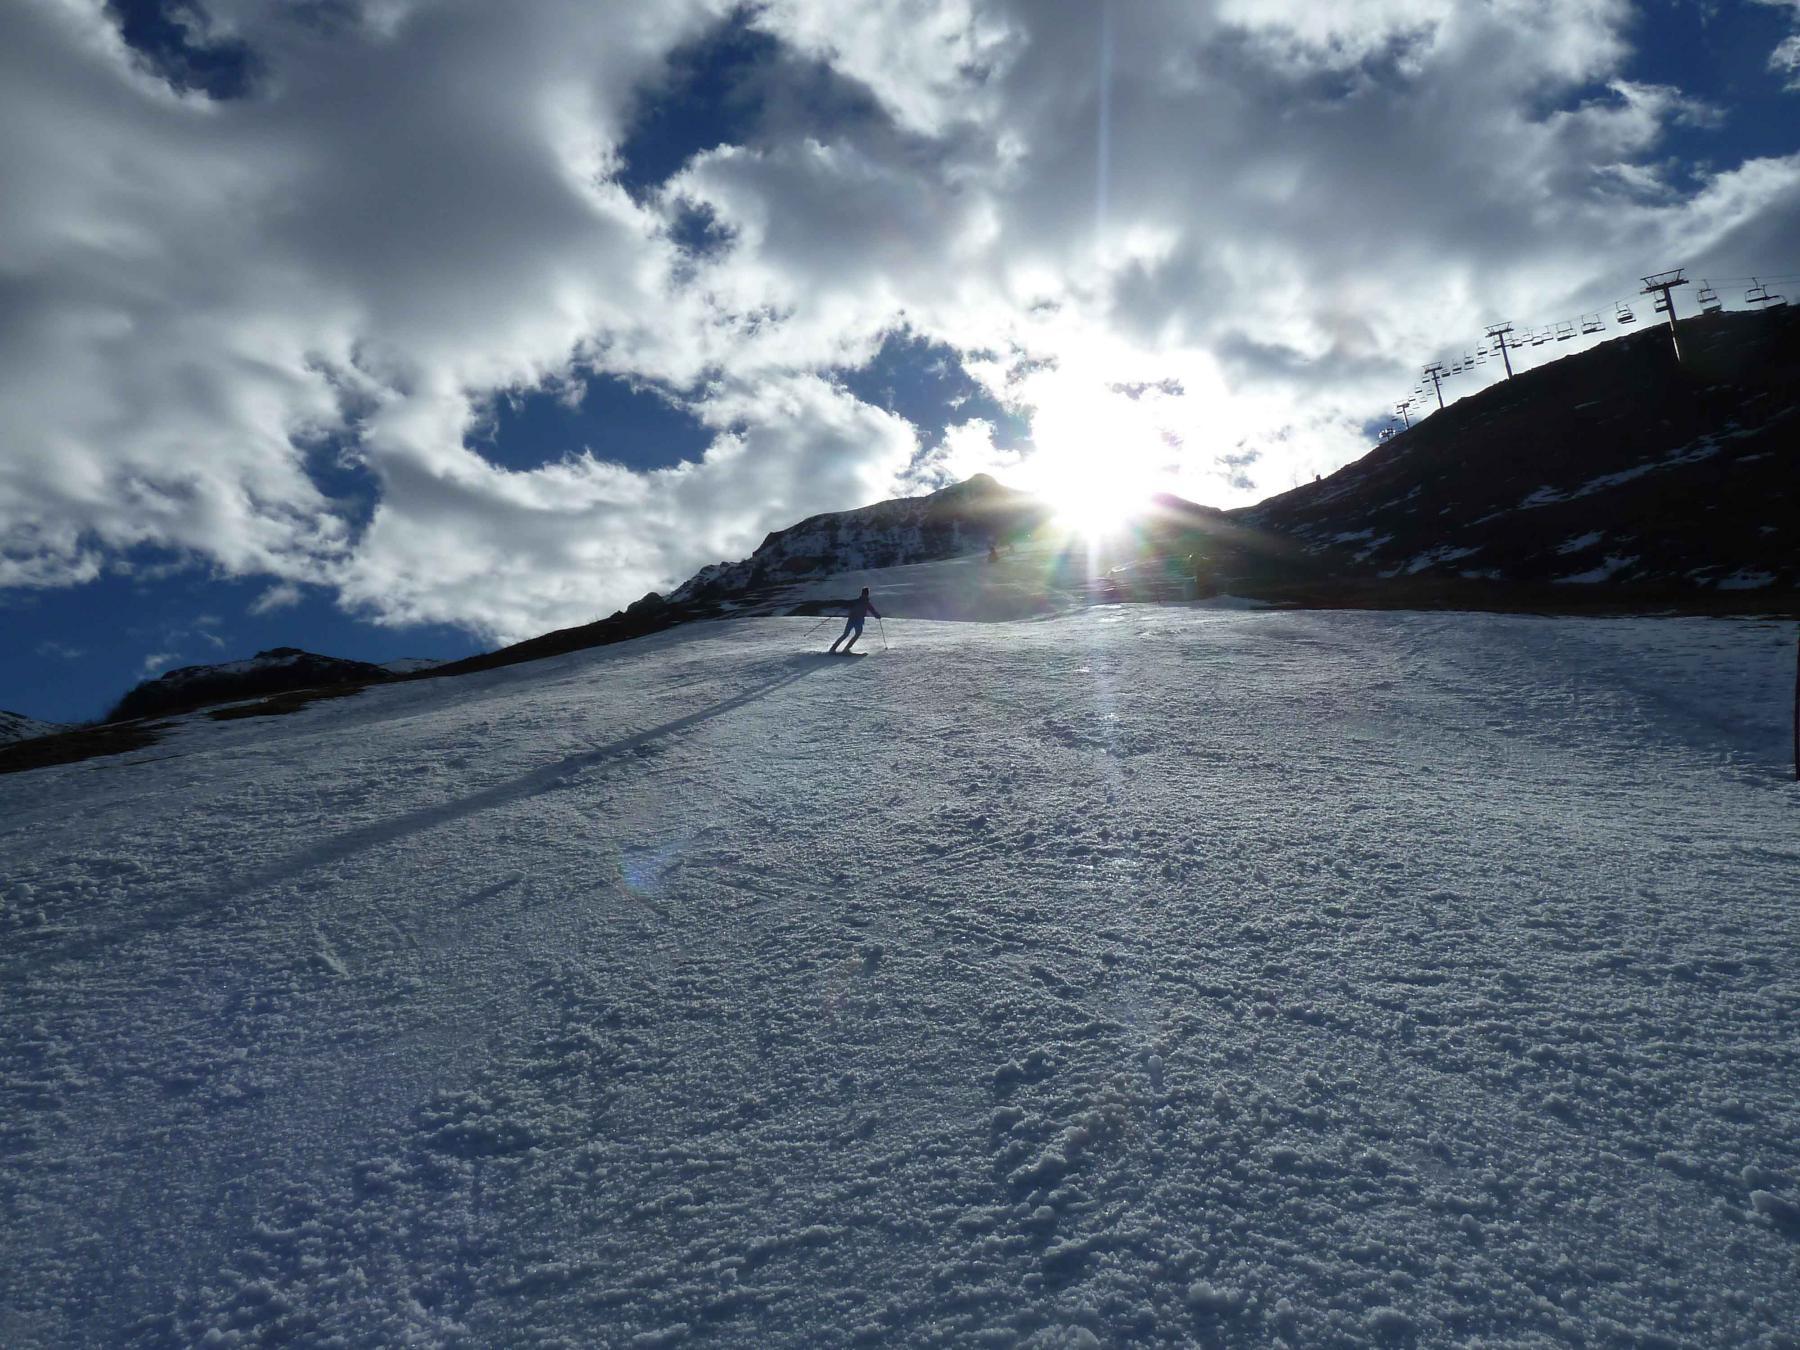 Verso Artesina Bassa, gran neve in pista oggi